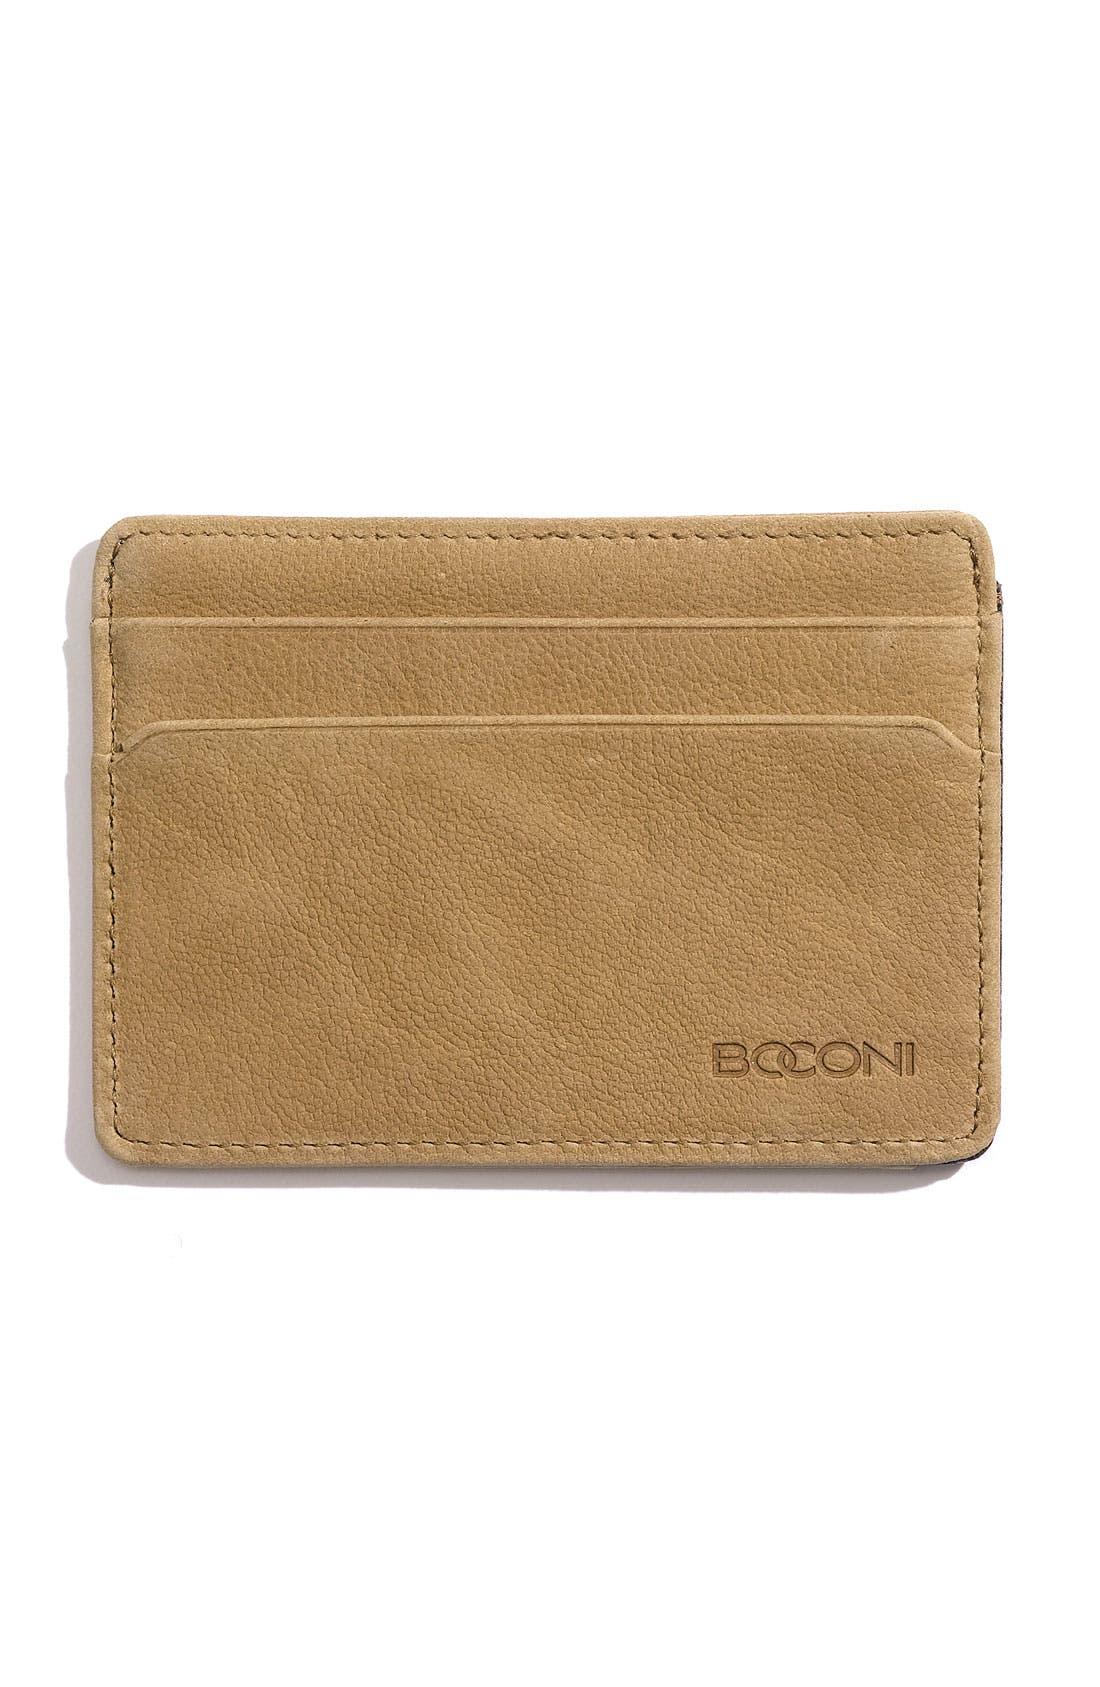 Main Image - Boconi 'Leon' Leather Credit Card Case